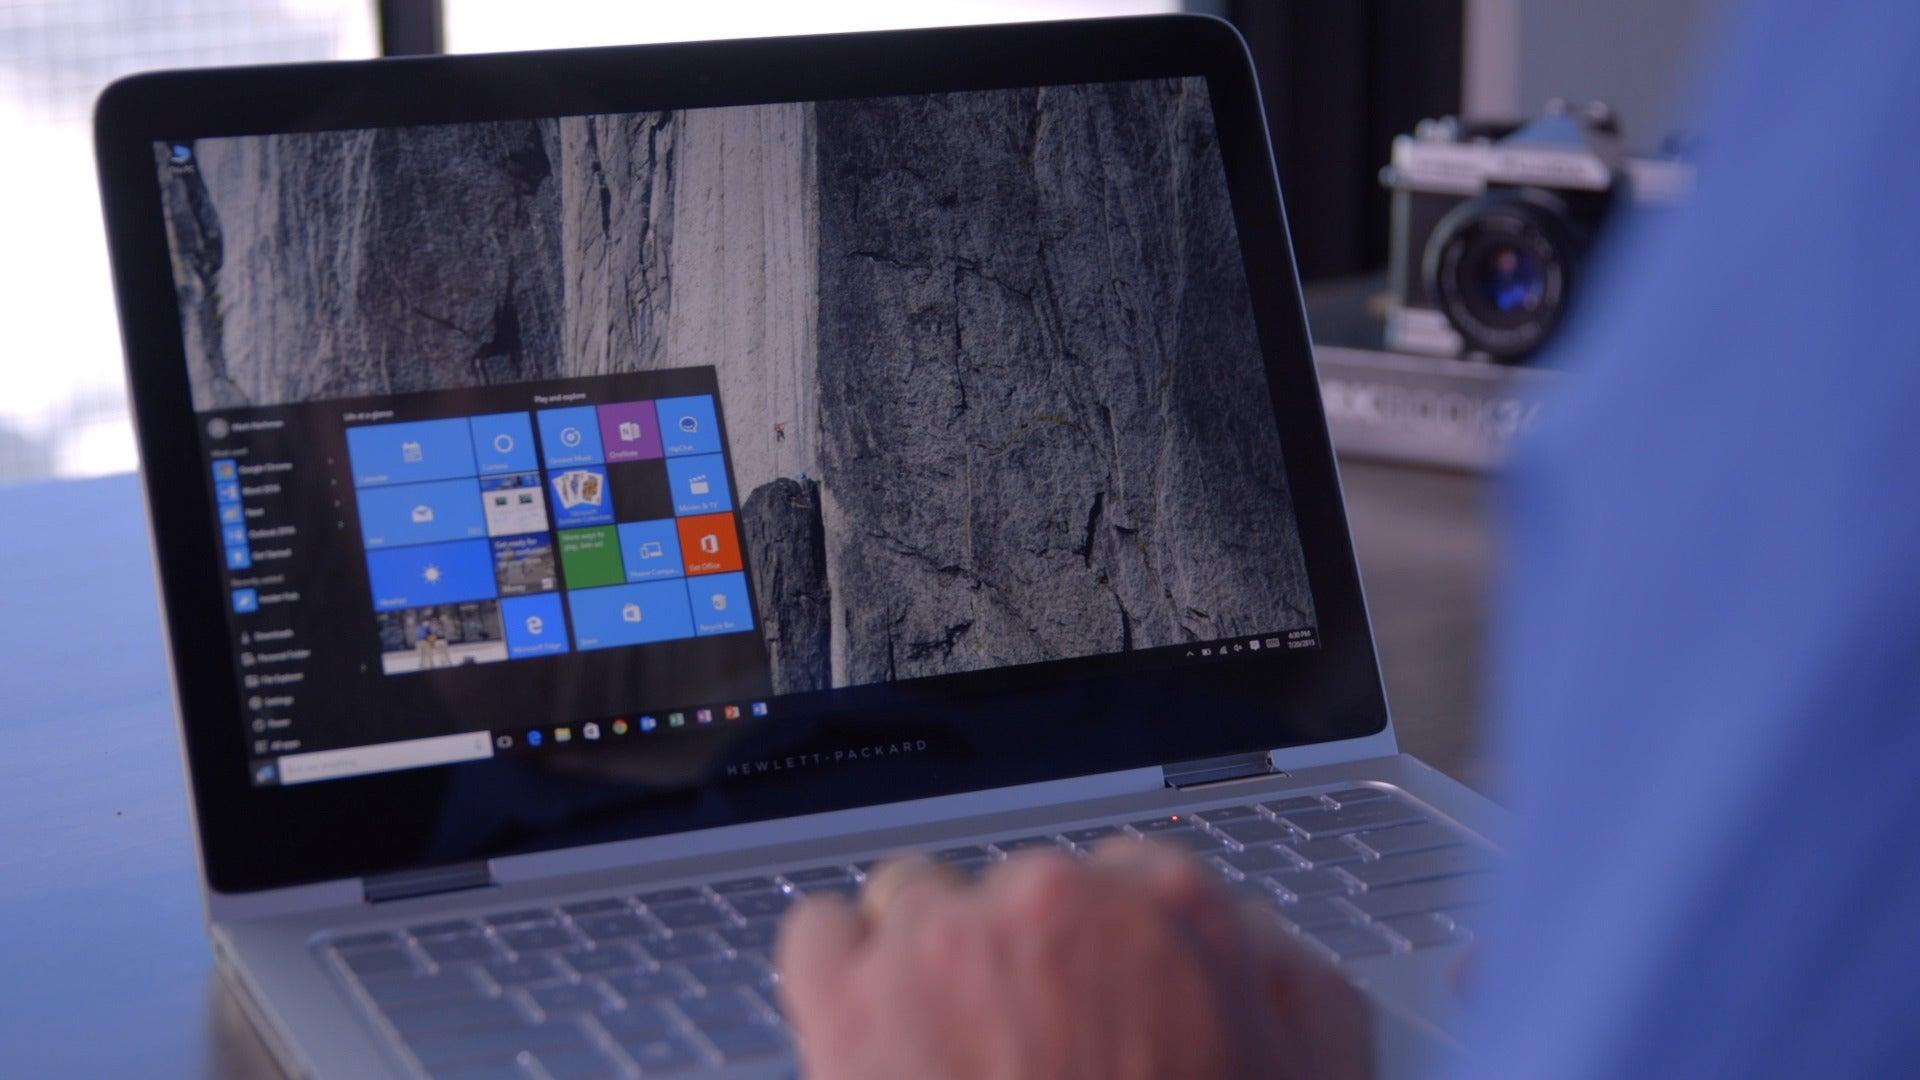 how to unlock a gateway laptop windows 8